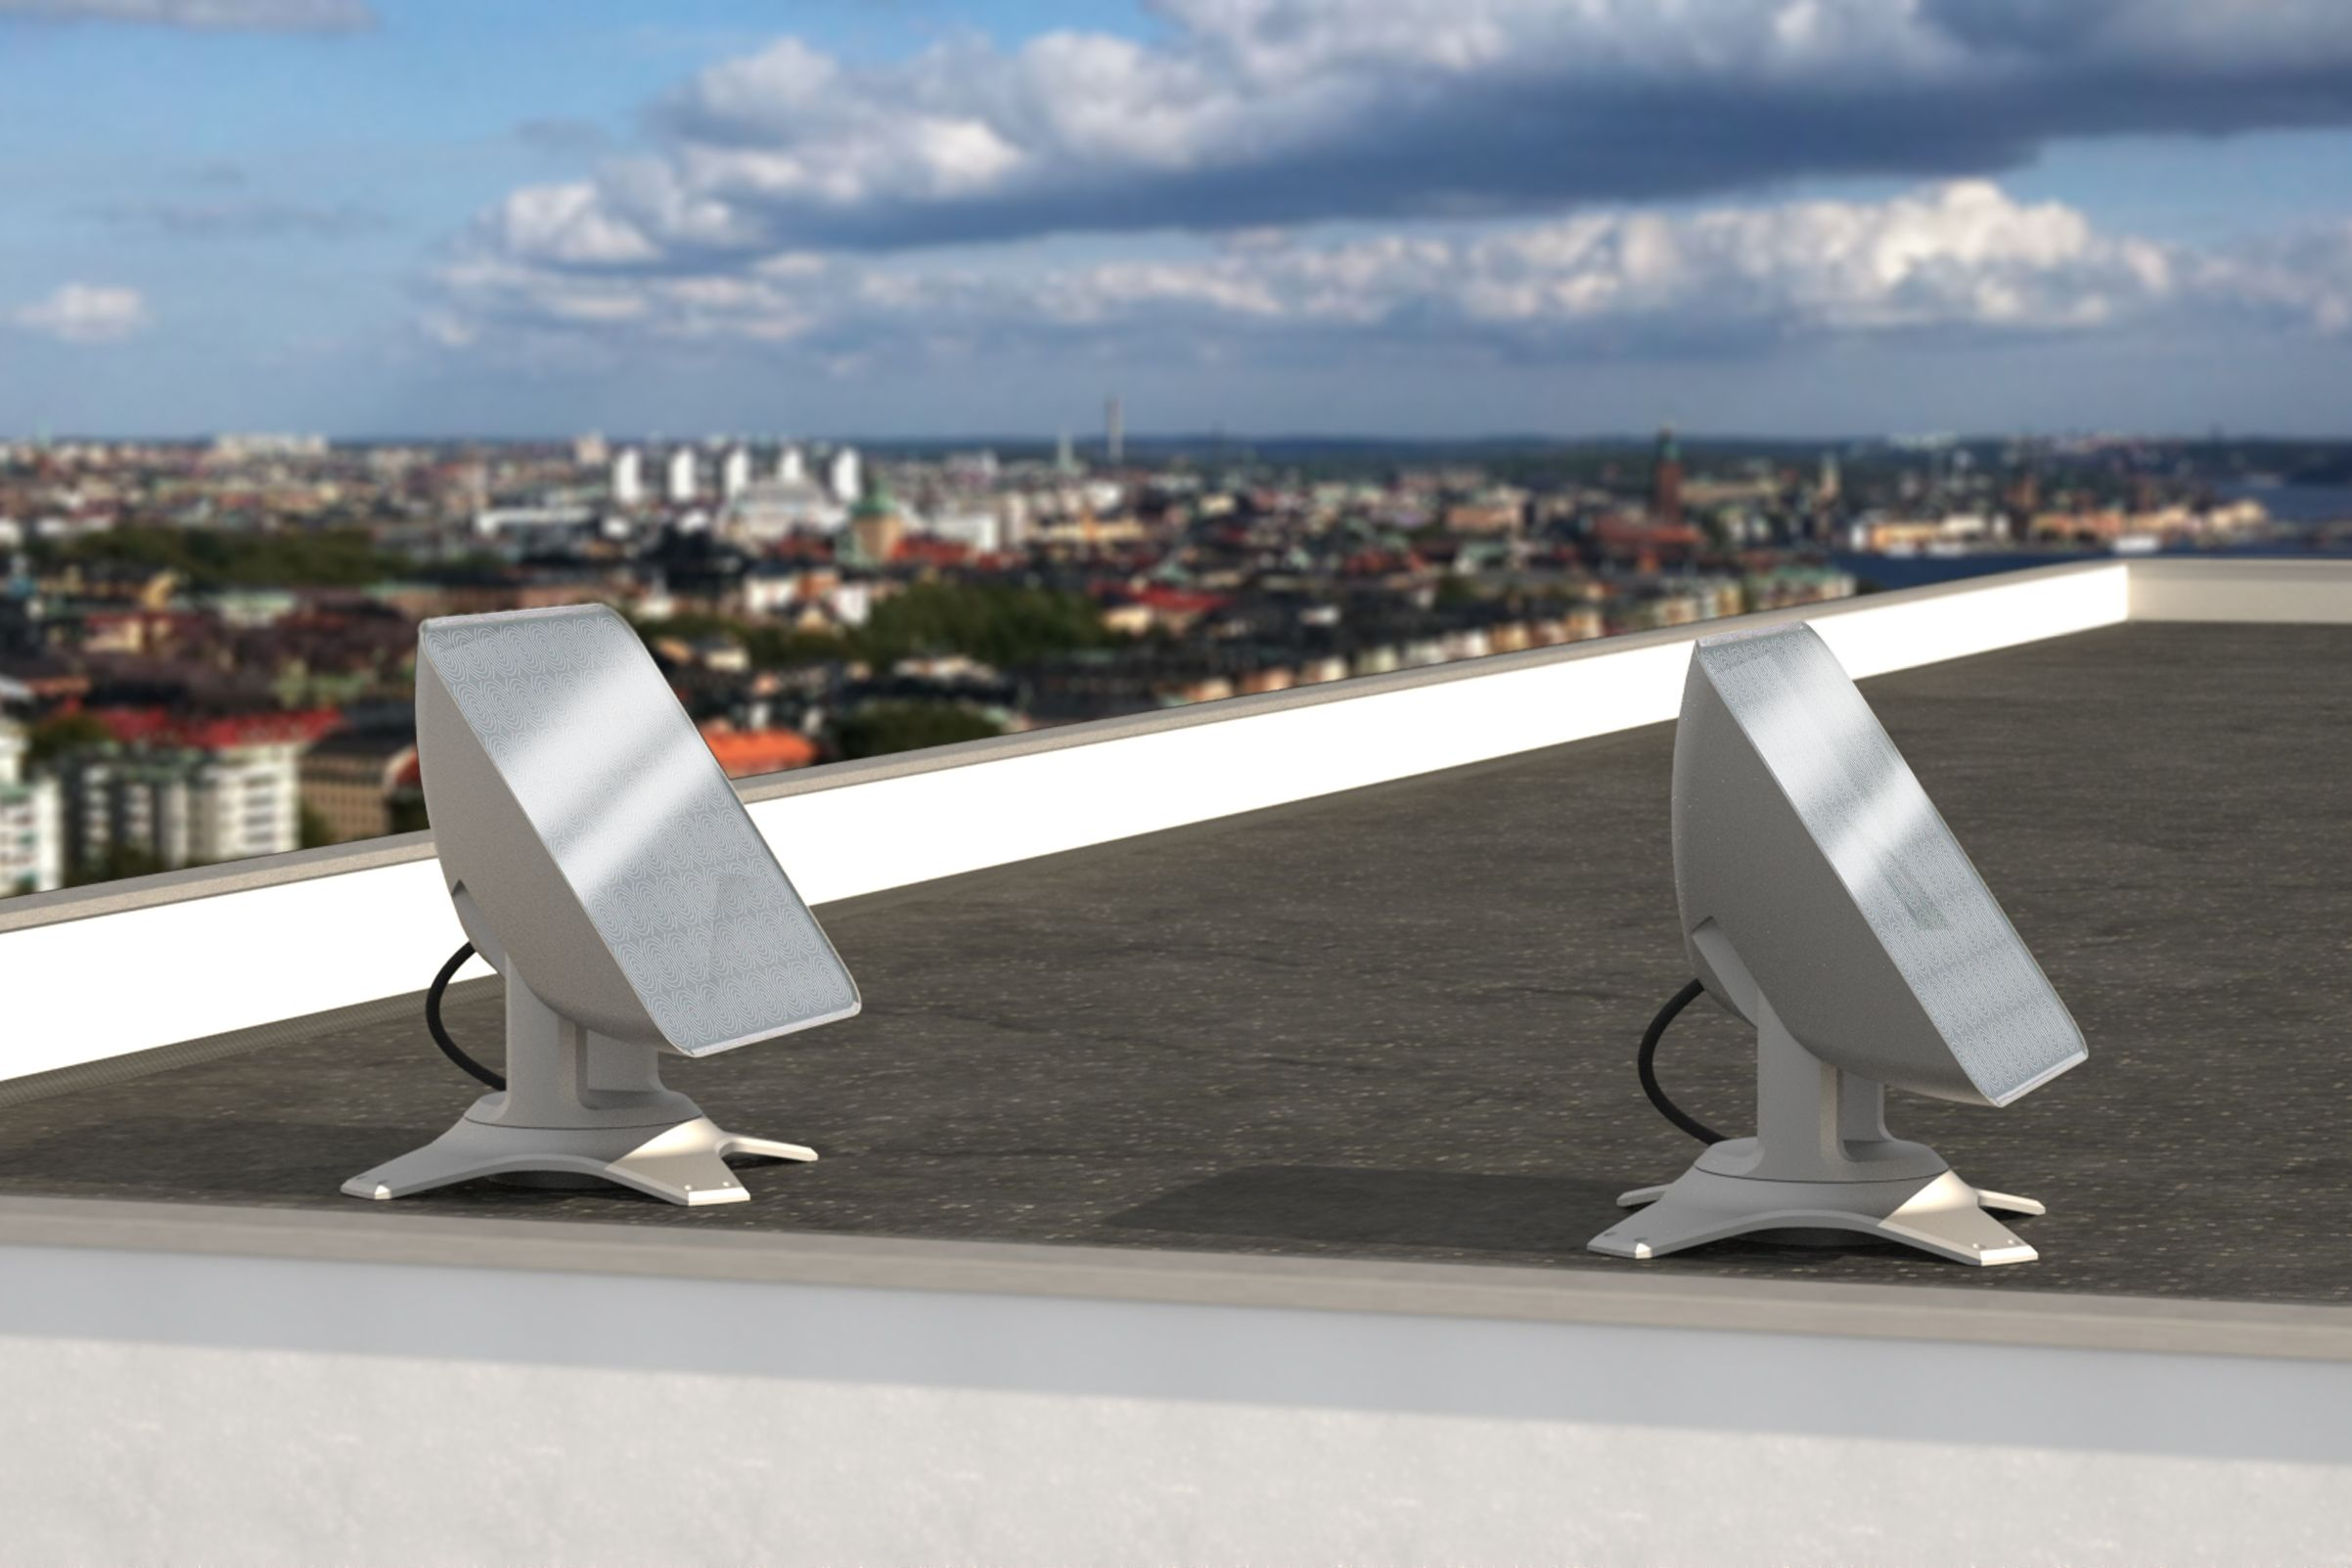 Parans Solar Lighting Concept